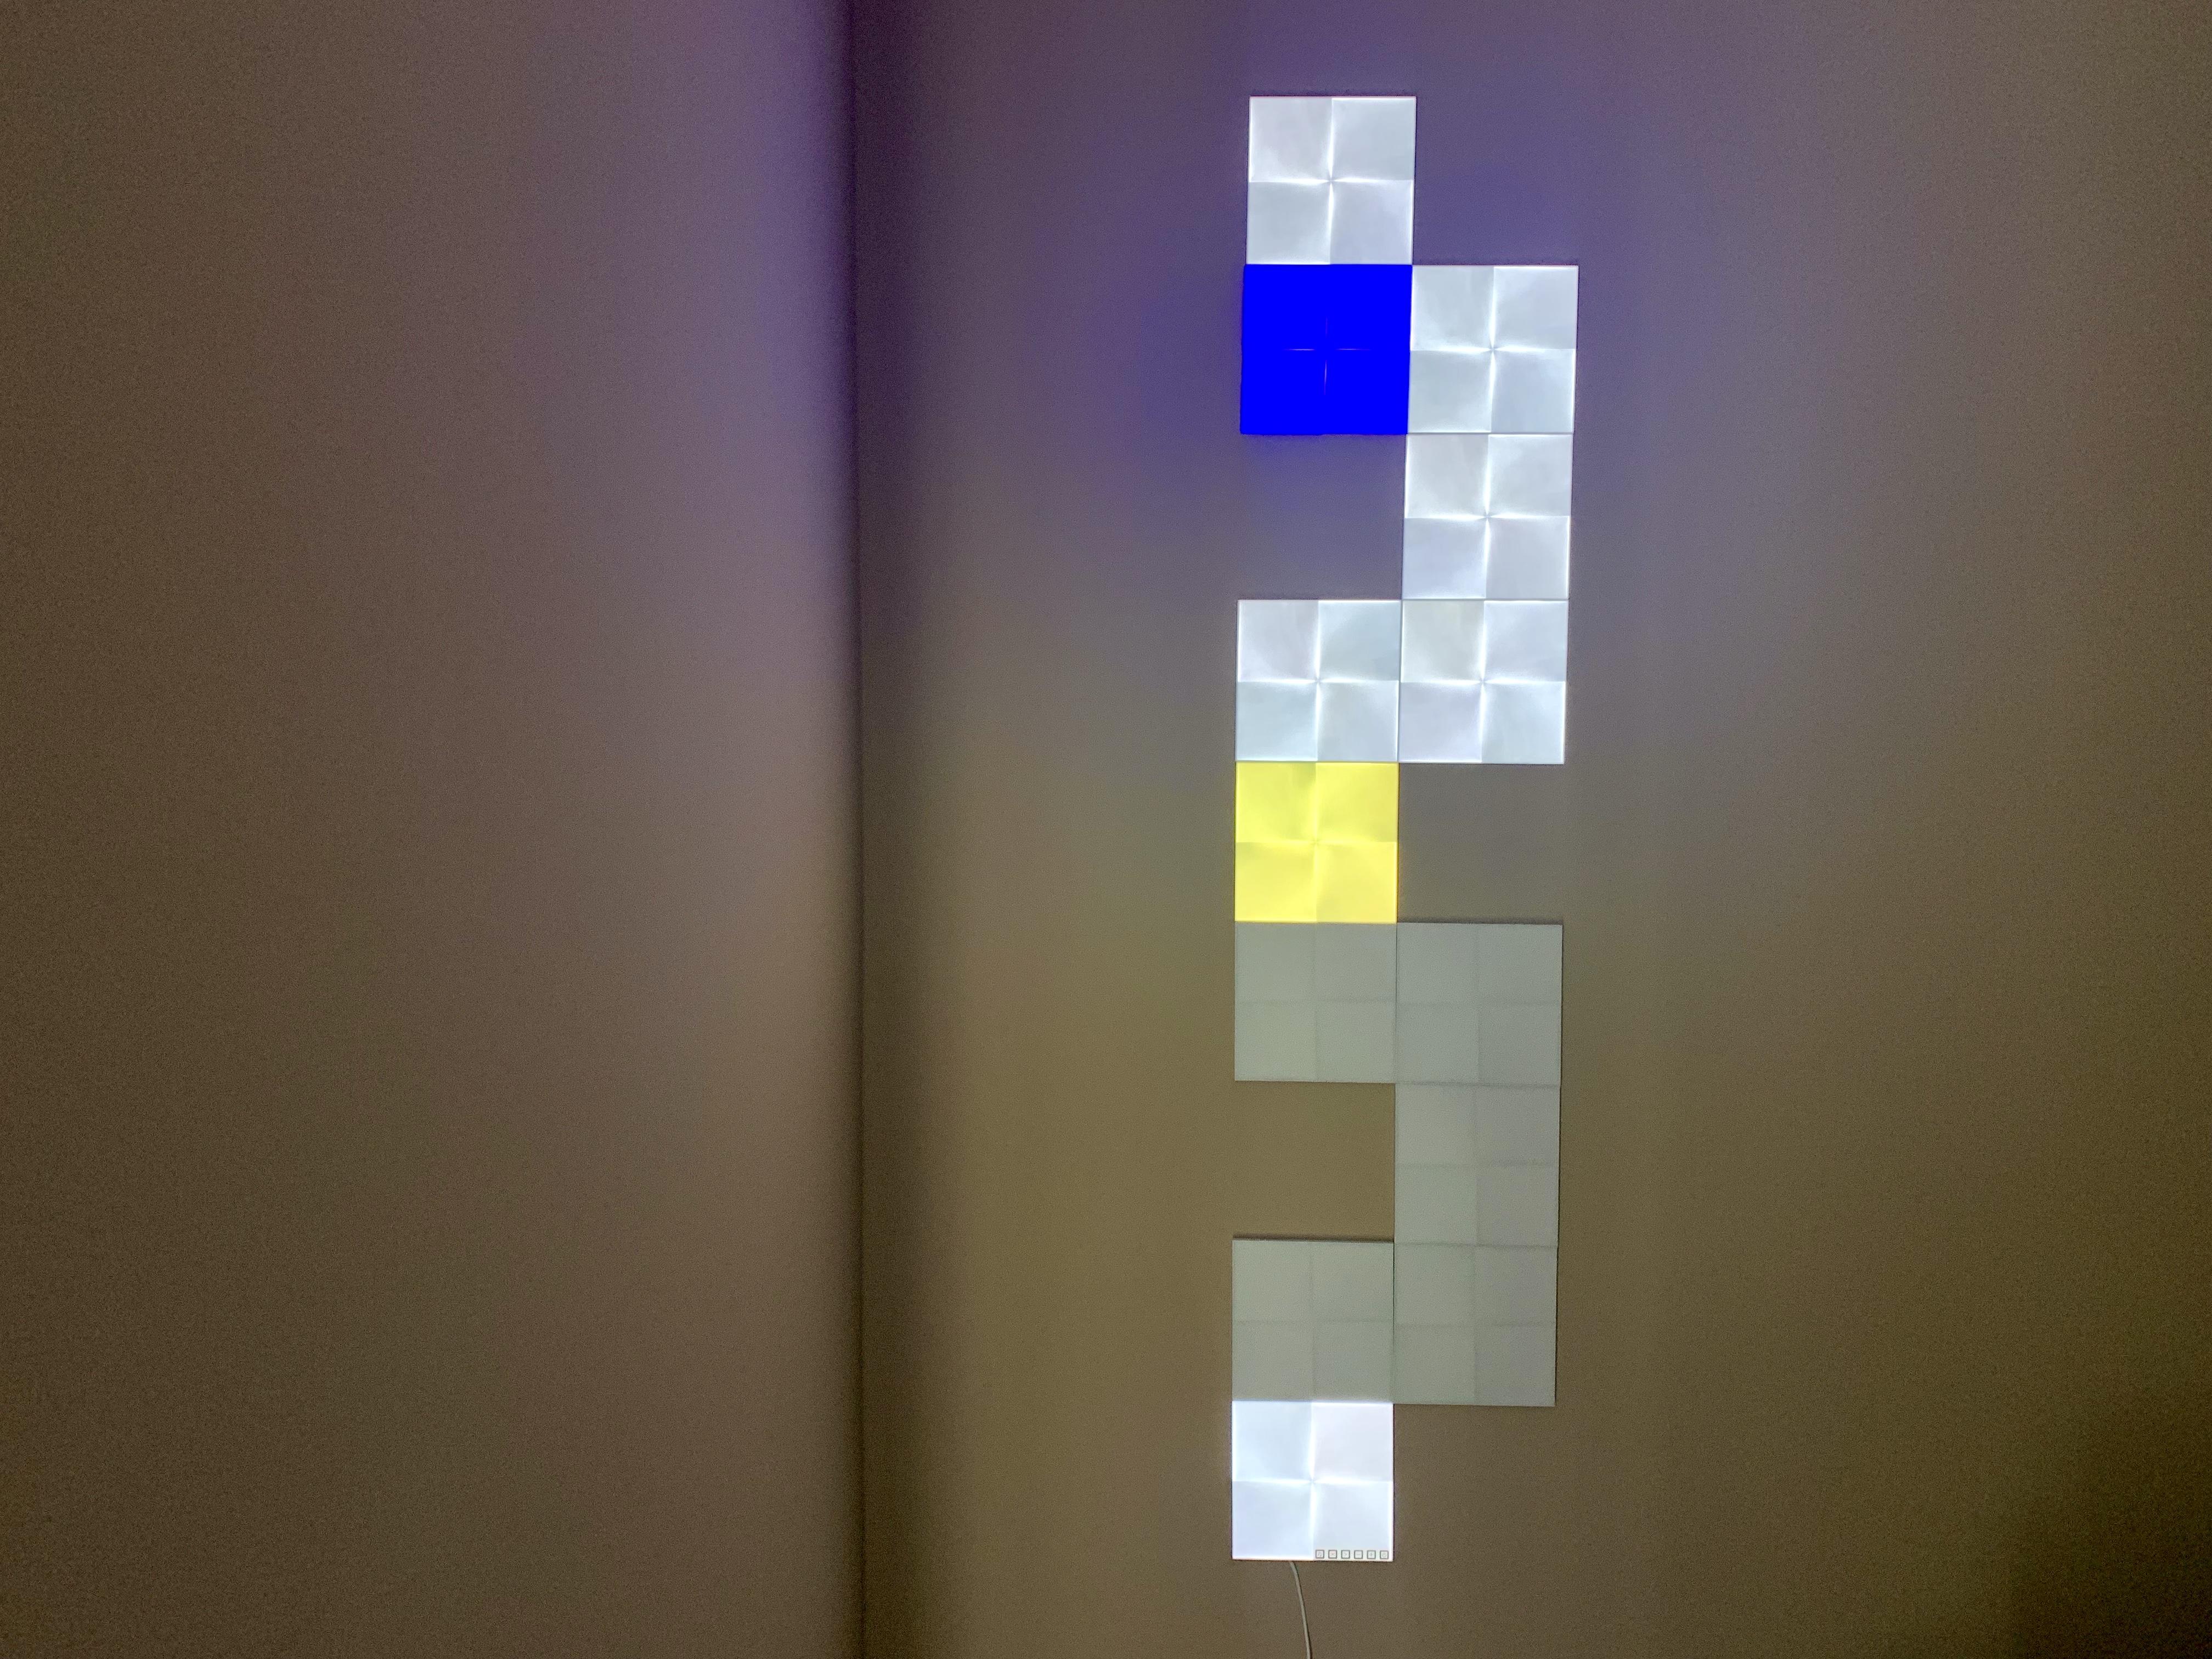 Nanoleaf Light Panels versus Canvas: HomeKit smart lighting - 9to5Mac